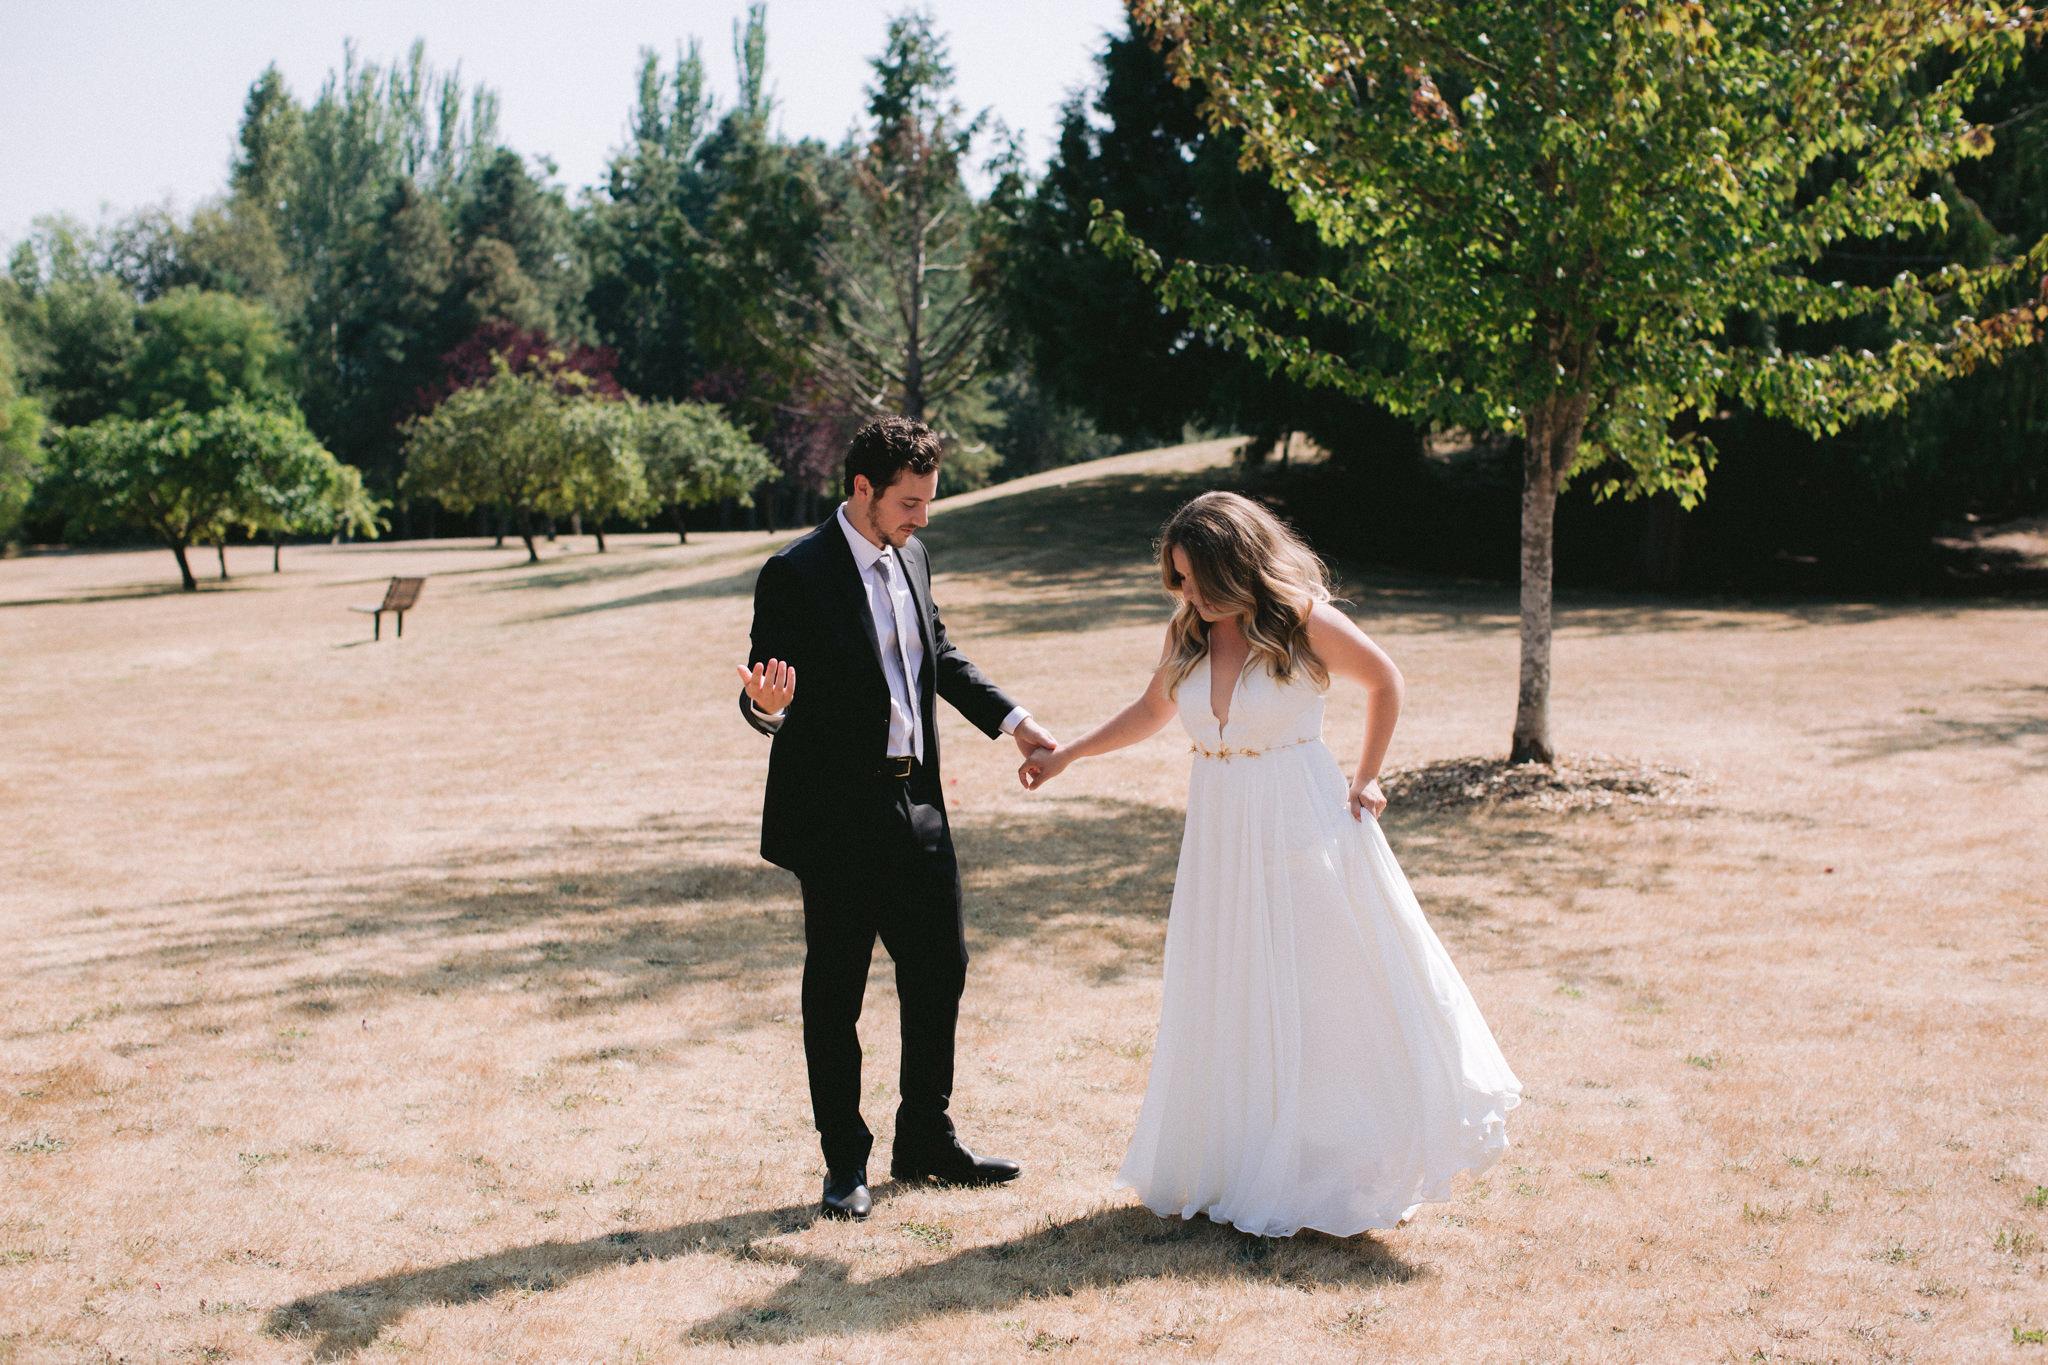 Backyard-Bainbridge-Island-Wedding-Alycia-Lovell-Photography-47.JPG